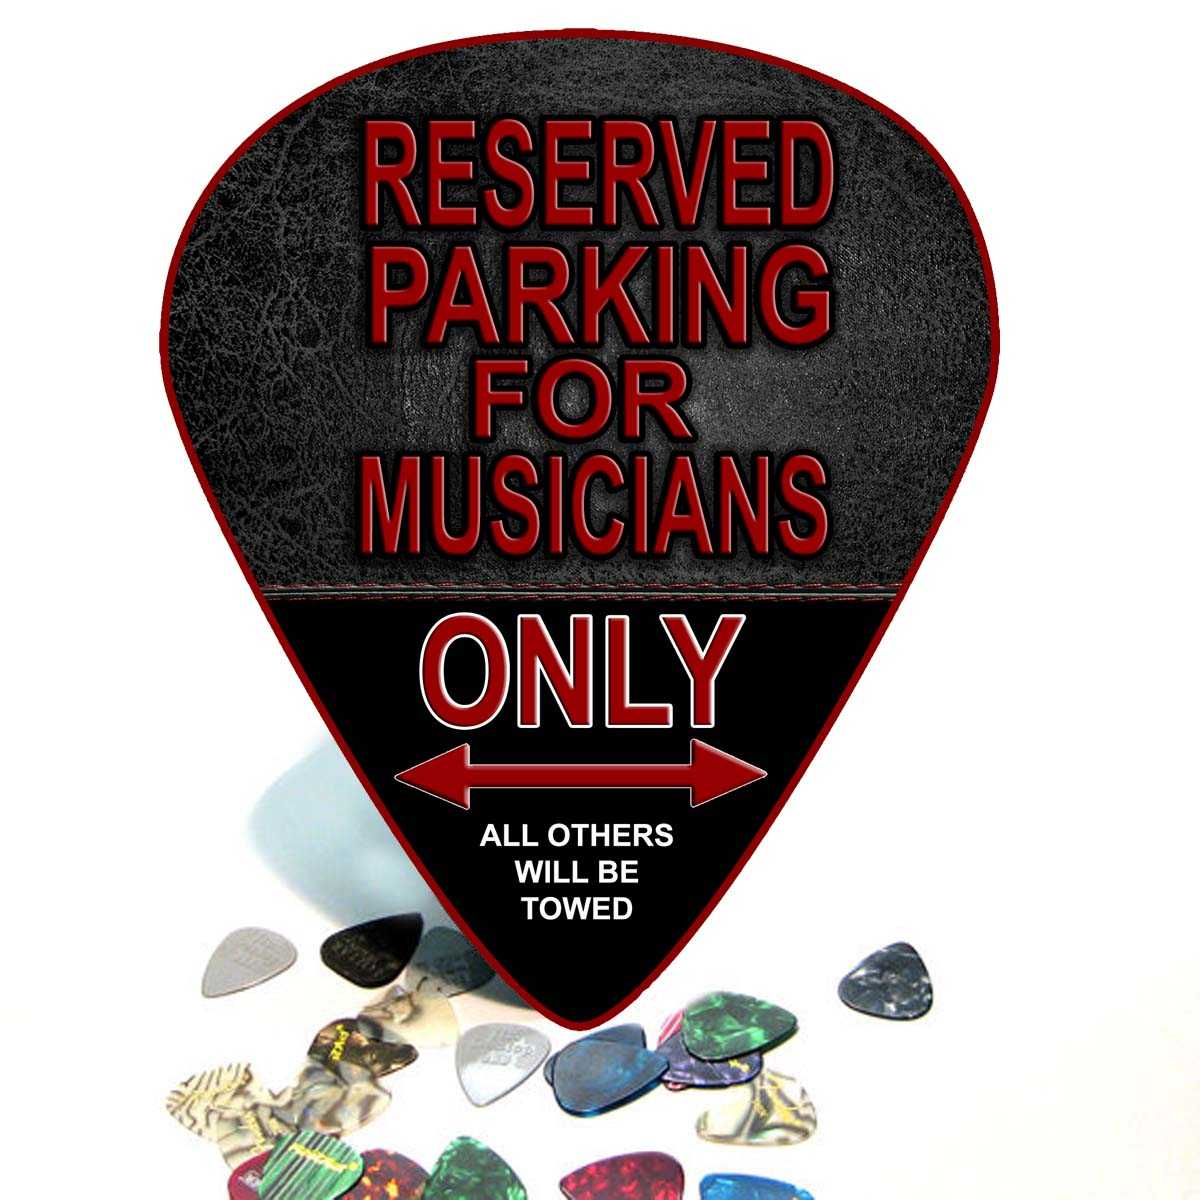 No Parking Guitar Giant Pick Wall Art  - 1126